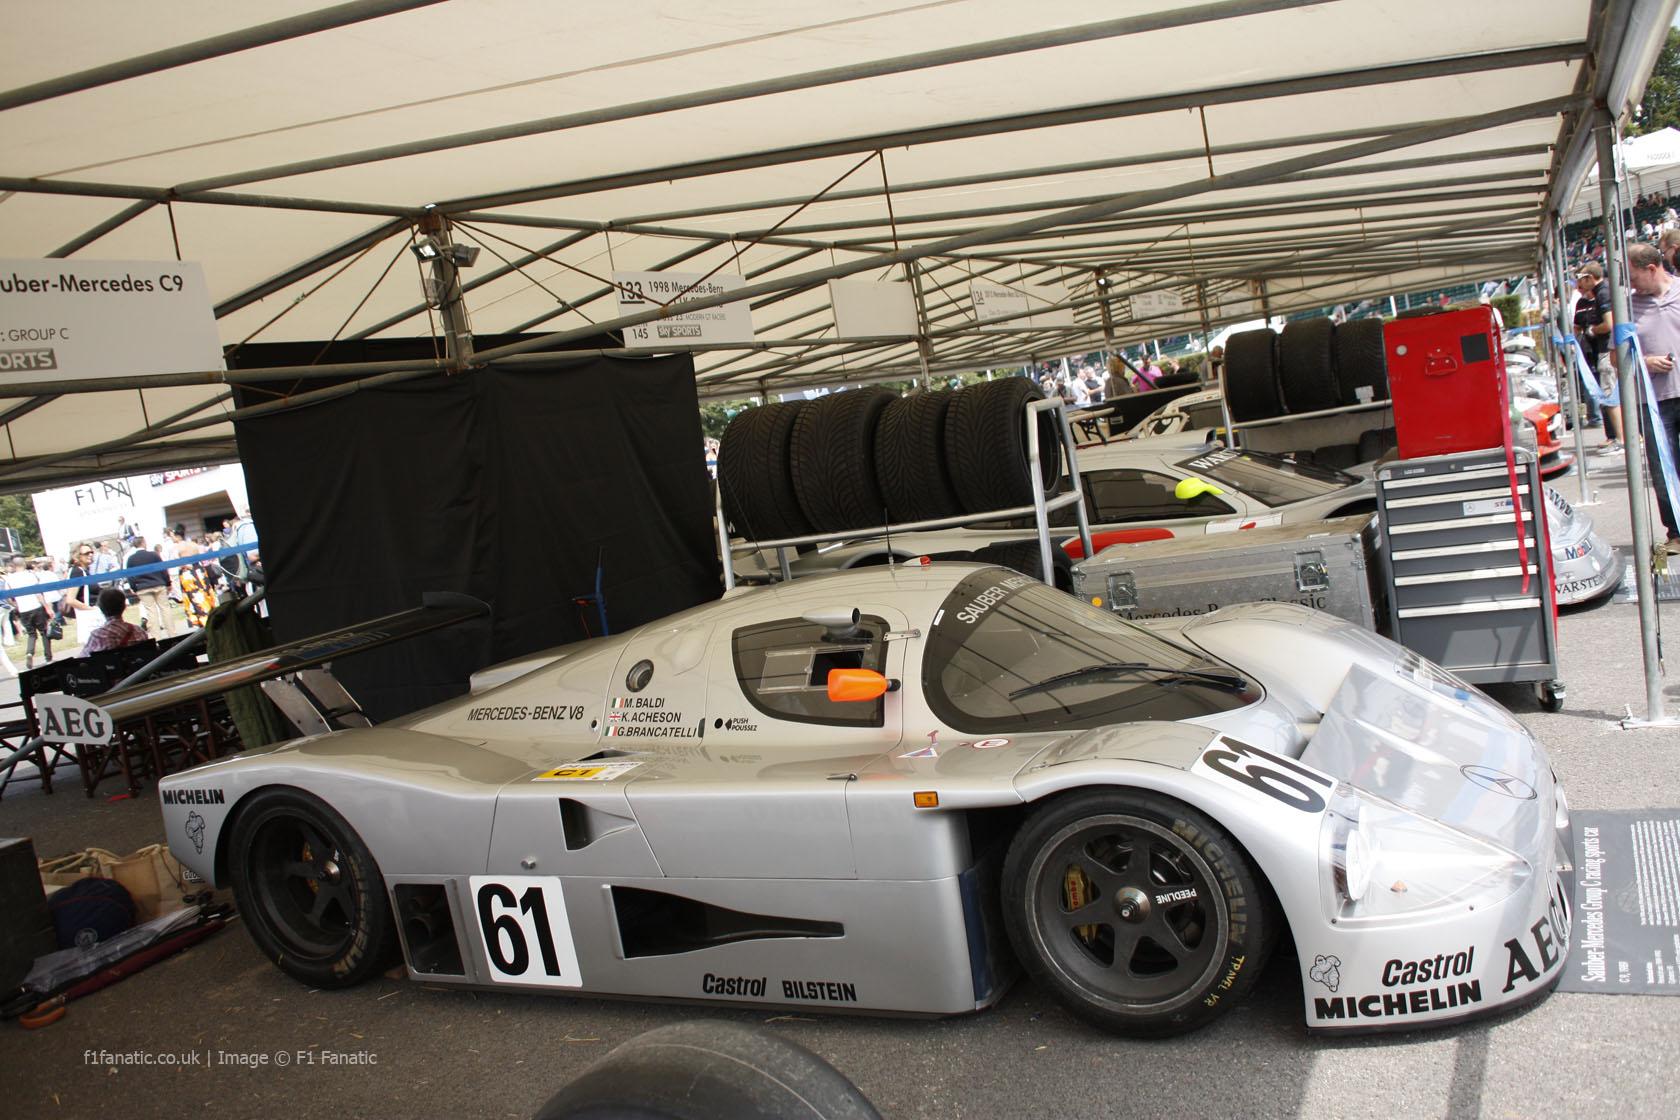 Sauber Mercedes C9, Goodwood Festival of Speed, 2014